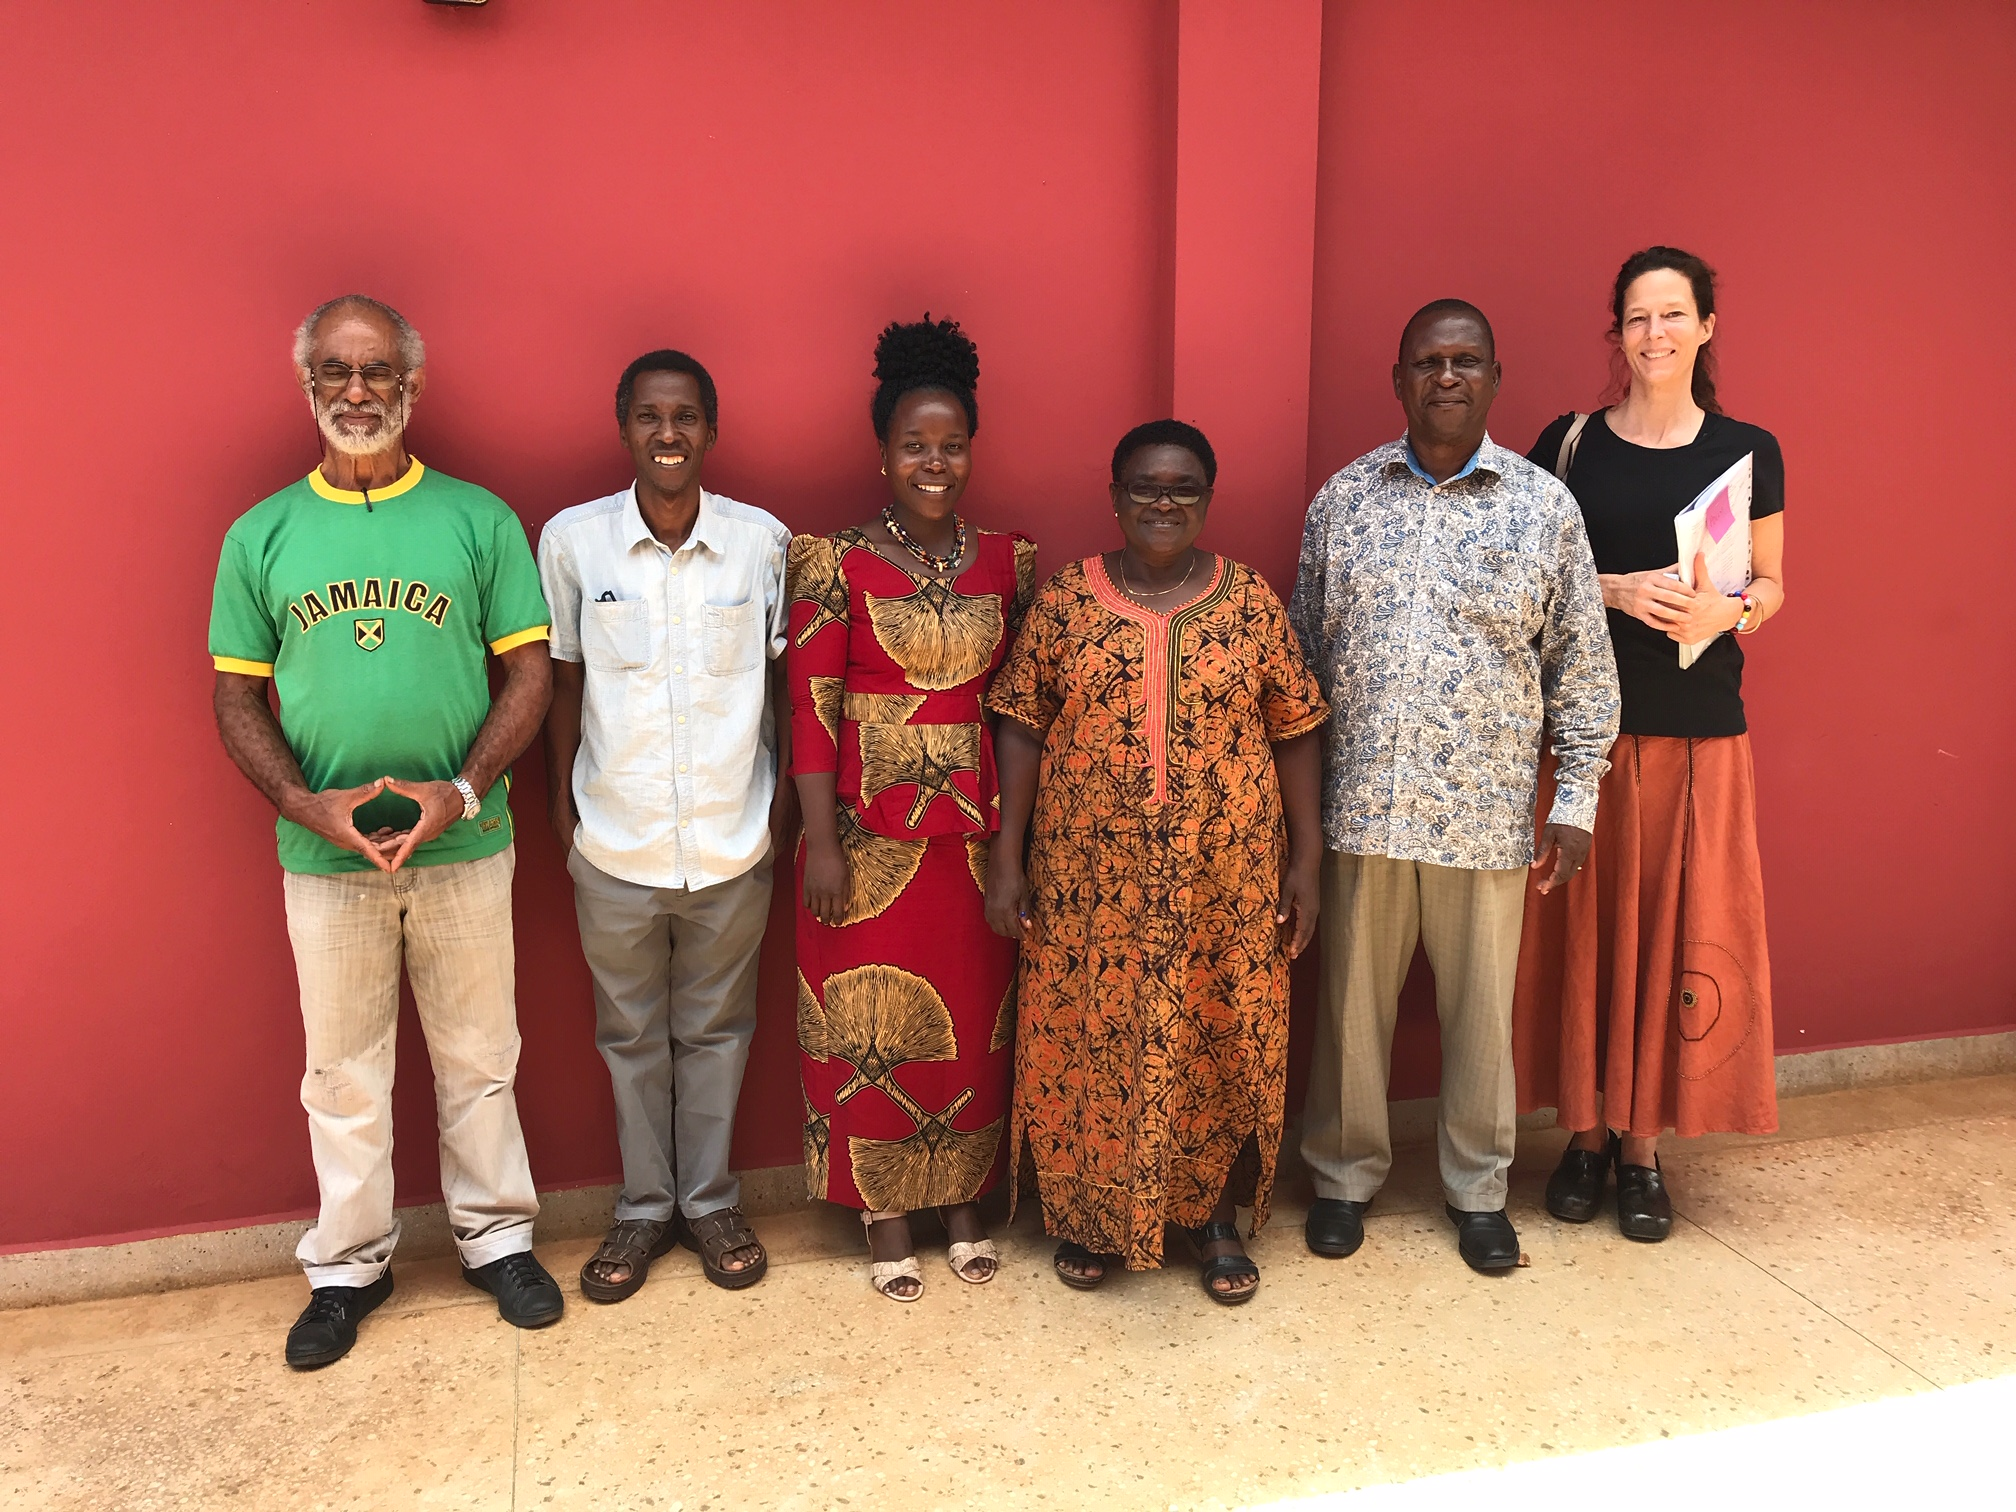 The SEGA Board of Directors in January 2019. From Left to Right; Lascelles Chen, Oscar Mlowe, Laina John Mwandoloma, Hellen Nkalang'ango, Blastus Mwizarubi and Polly Dolan. Not pictured: Demetrius Malopola.